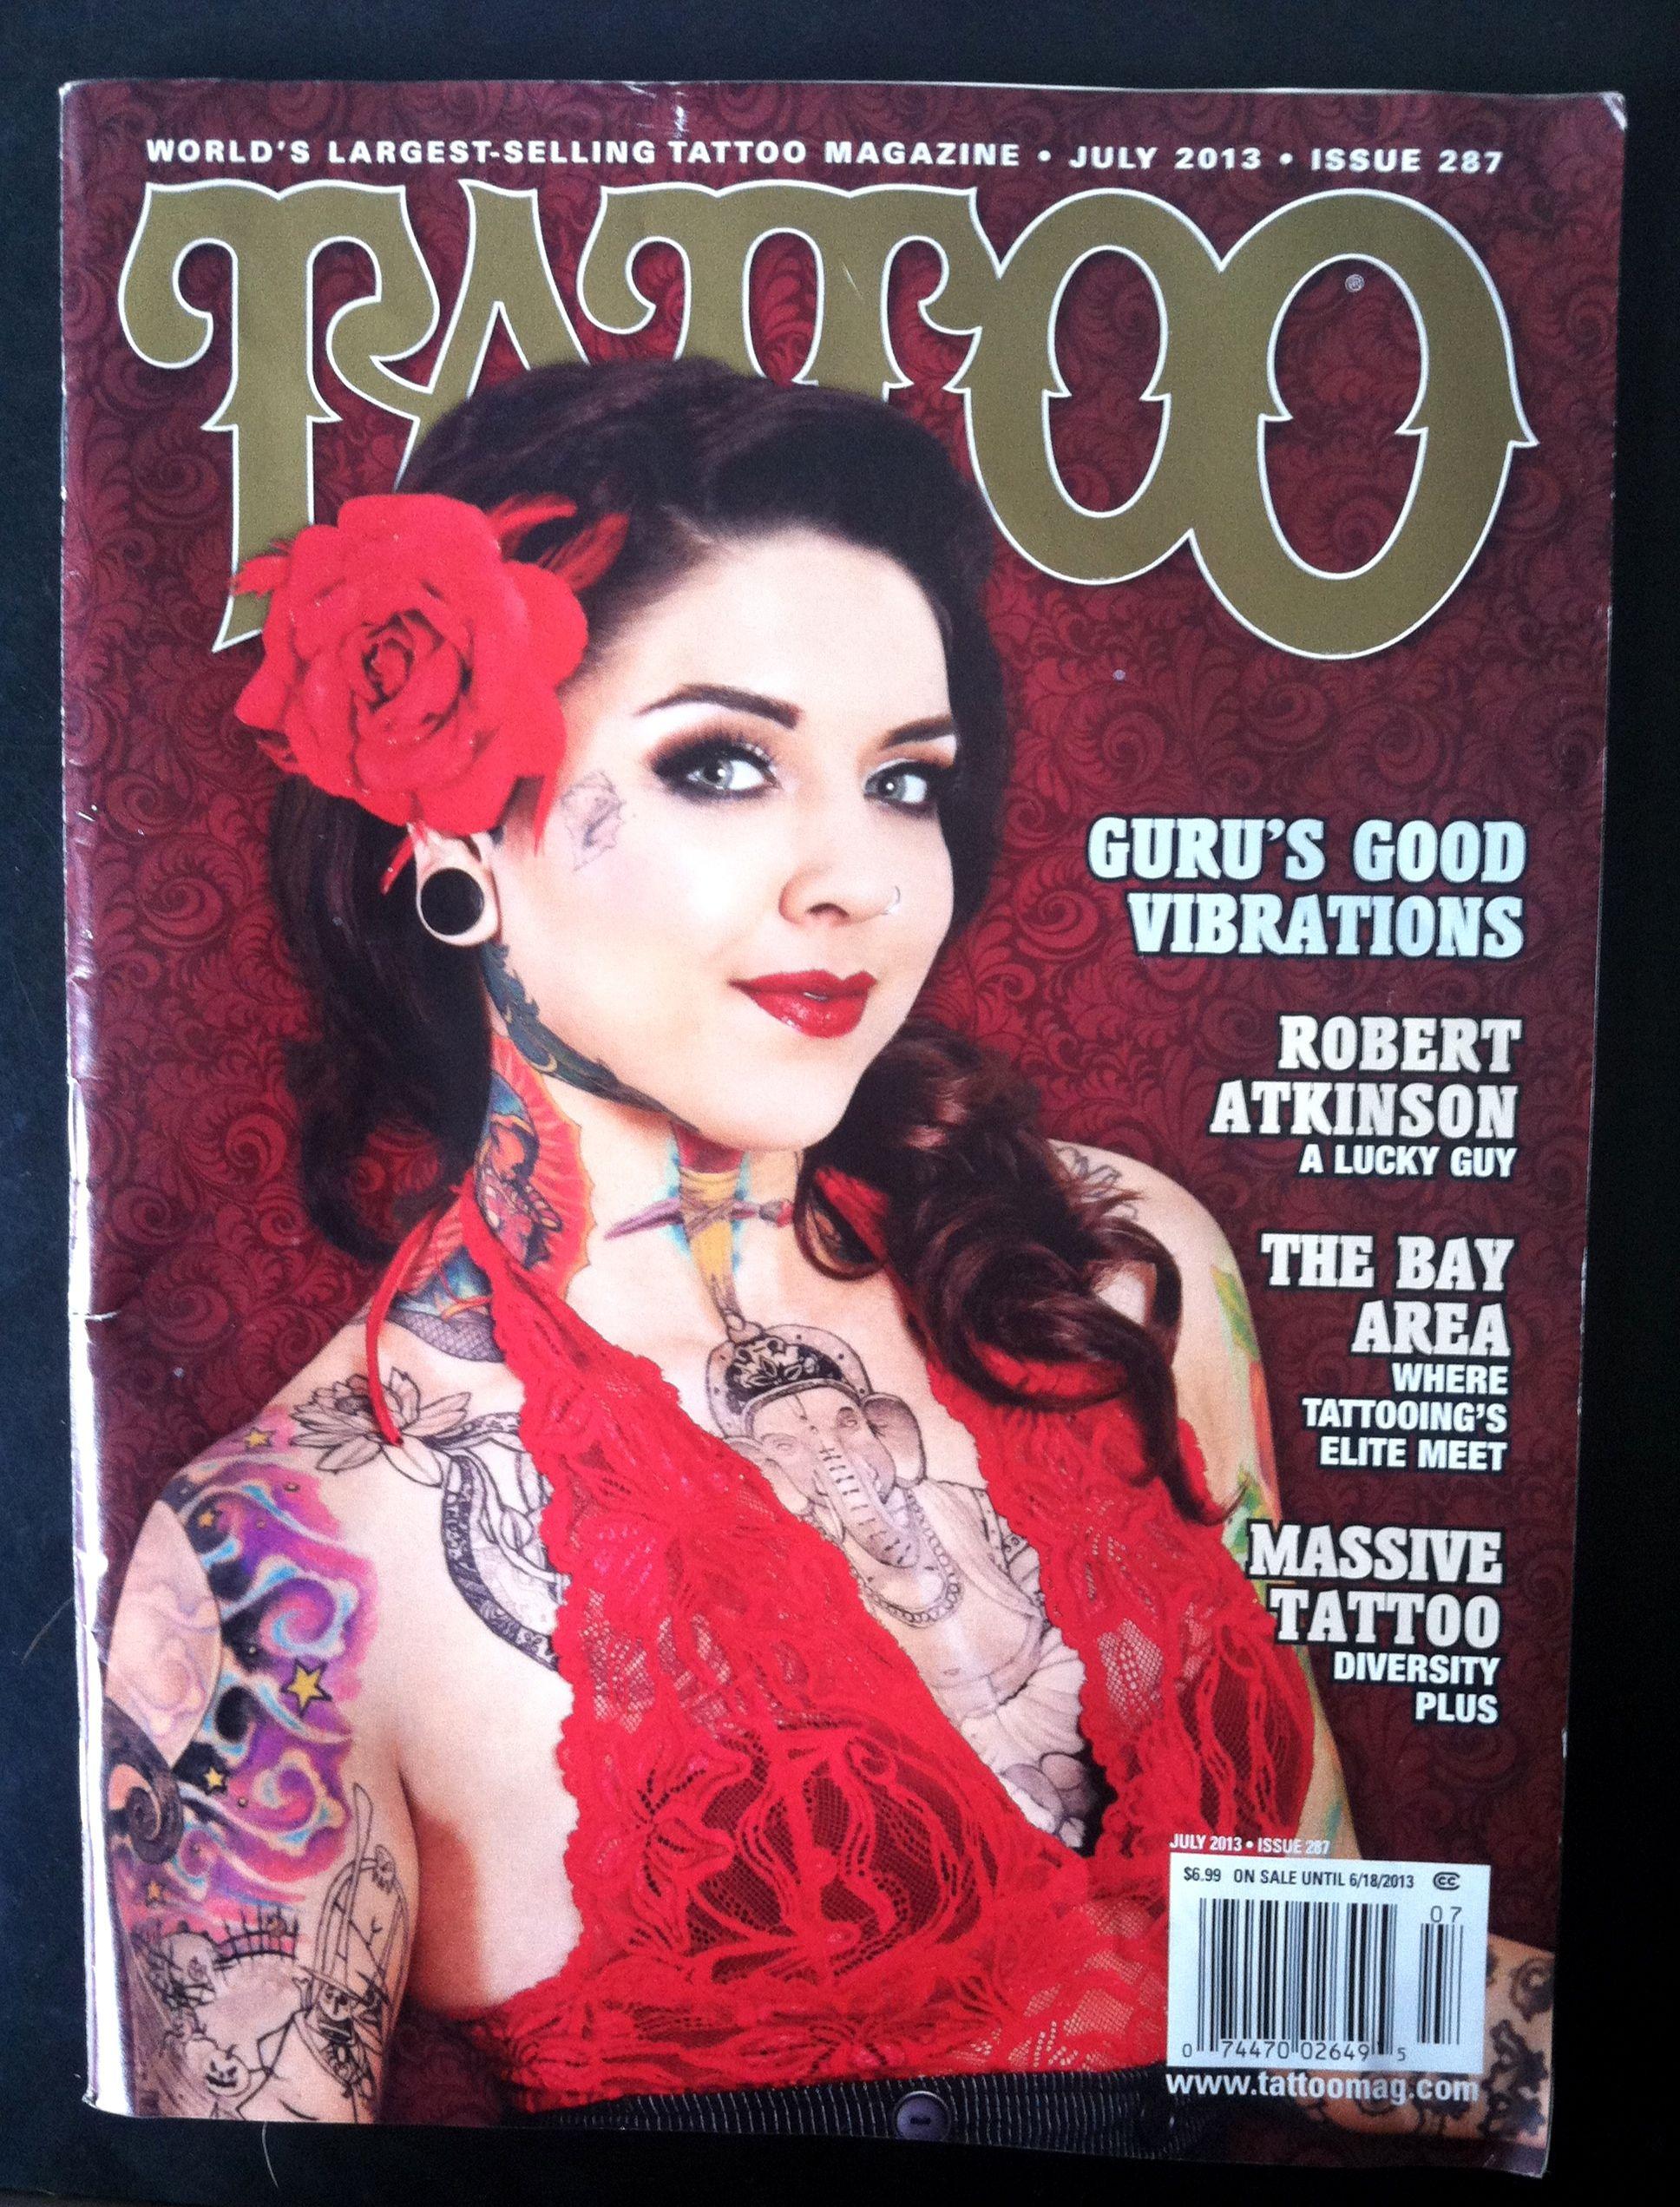 tattoo magazine   Tattoo Magazine July 2013 My back piece is ...